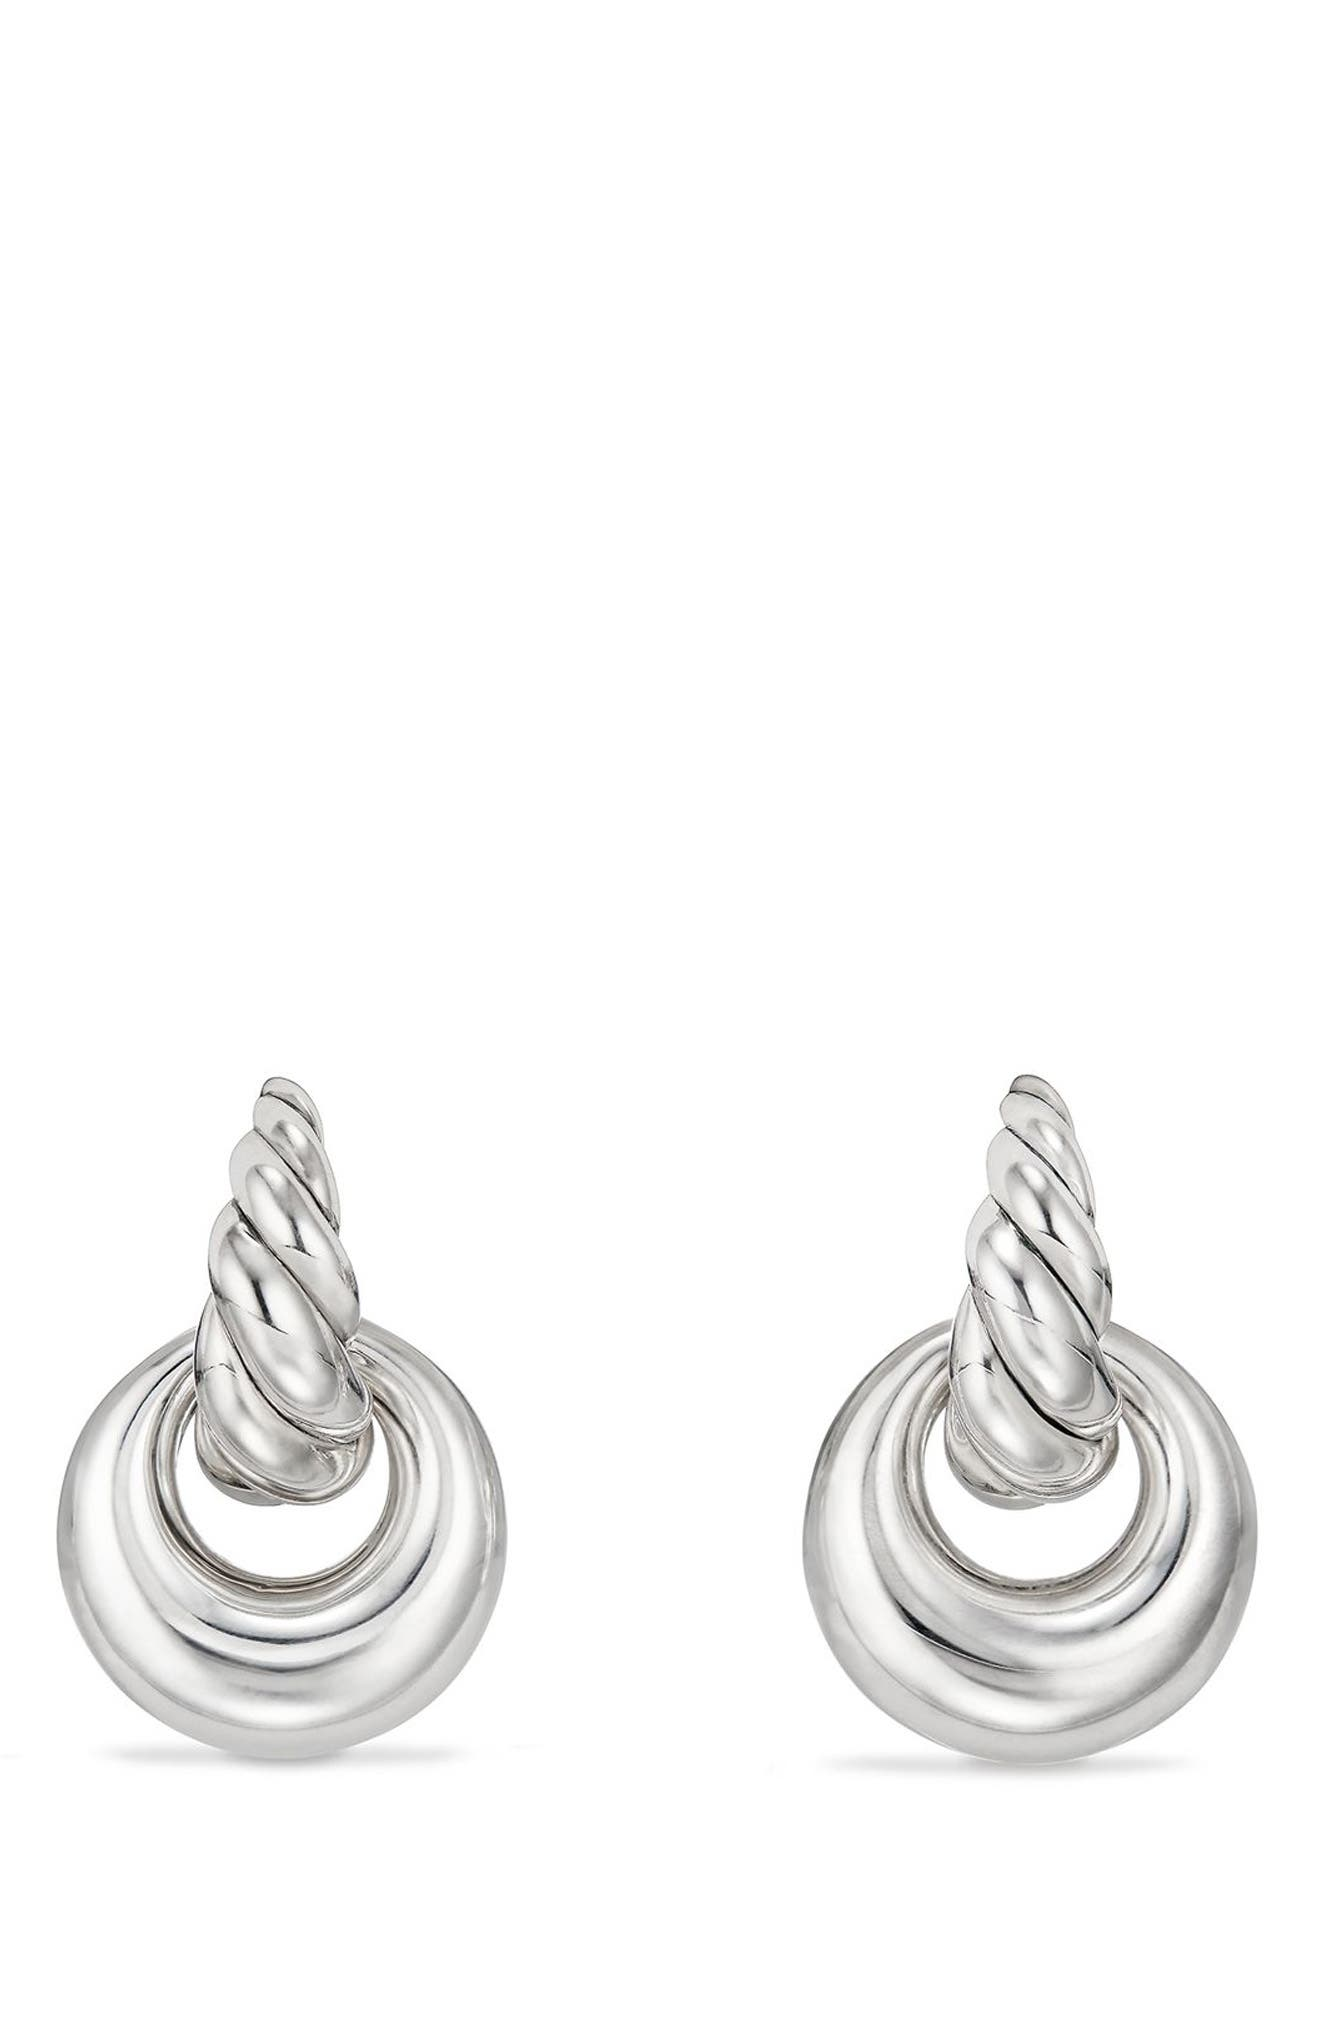 David Yurman Pure Form Drop Earrings